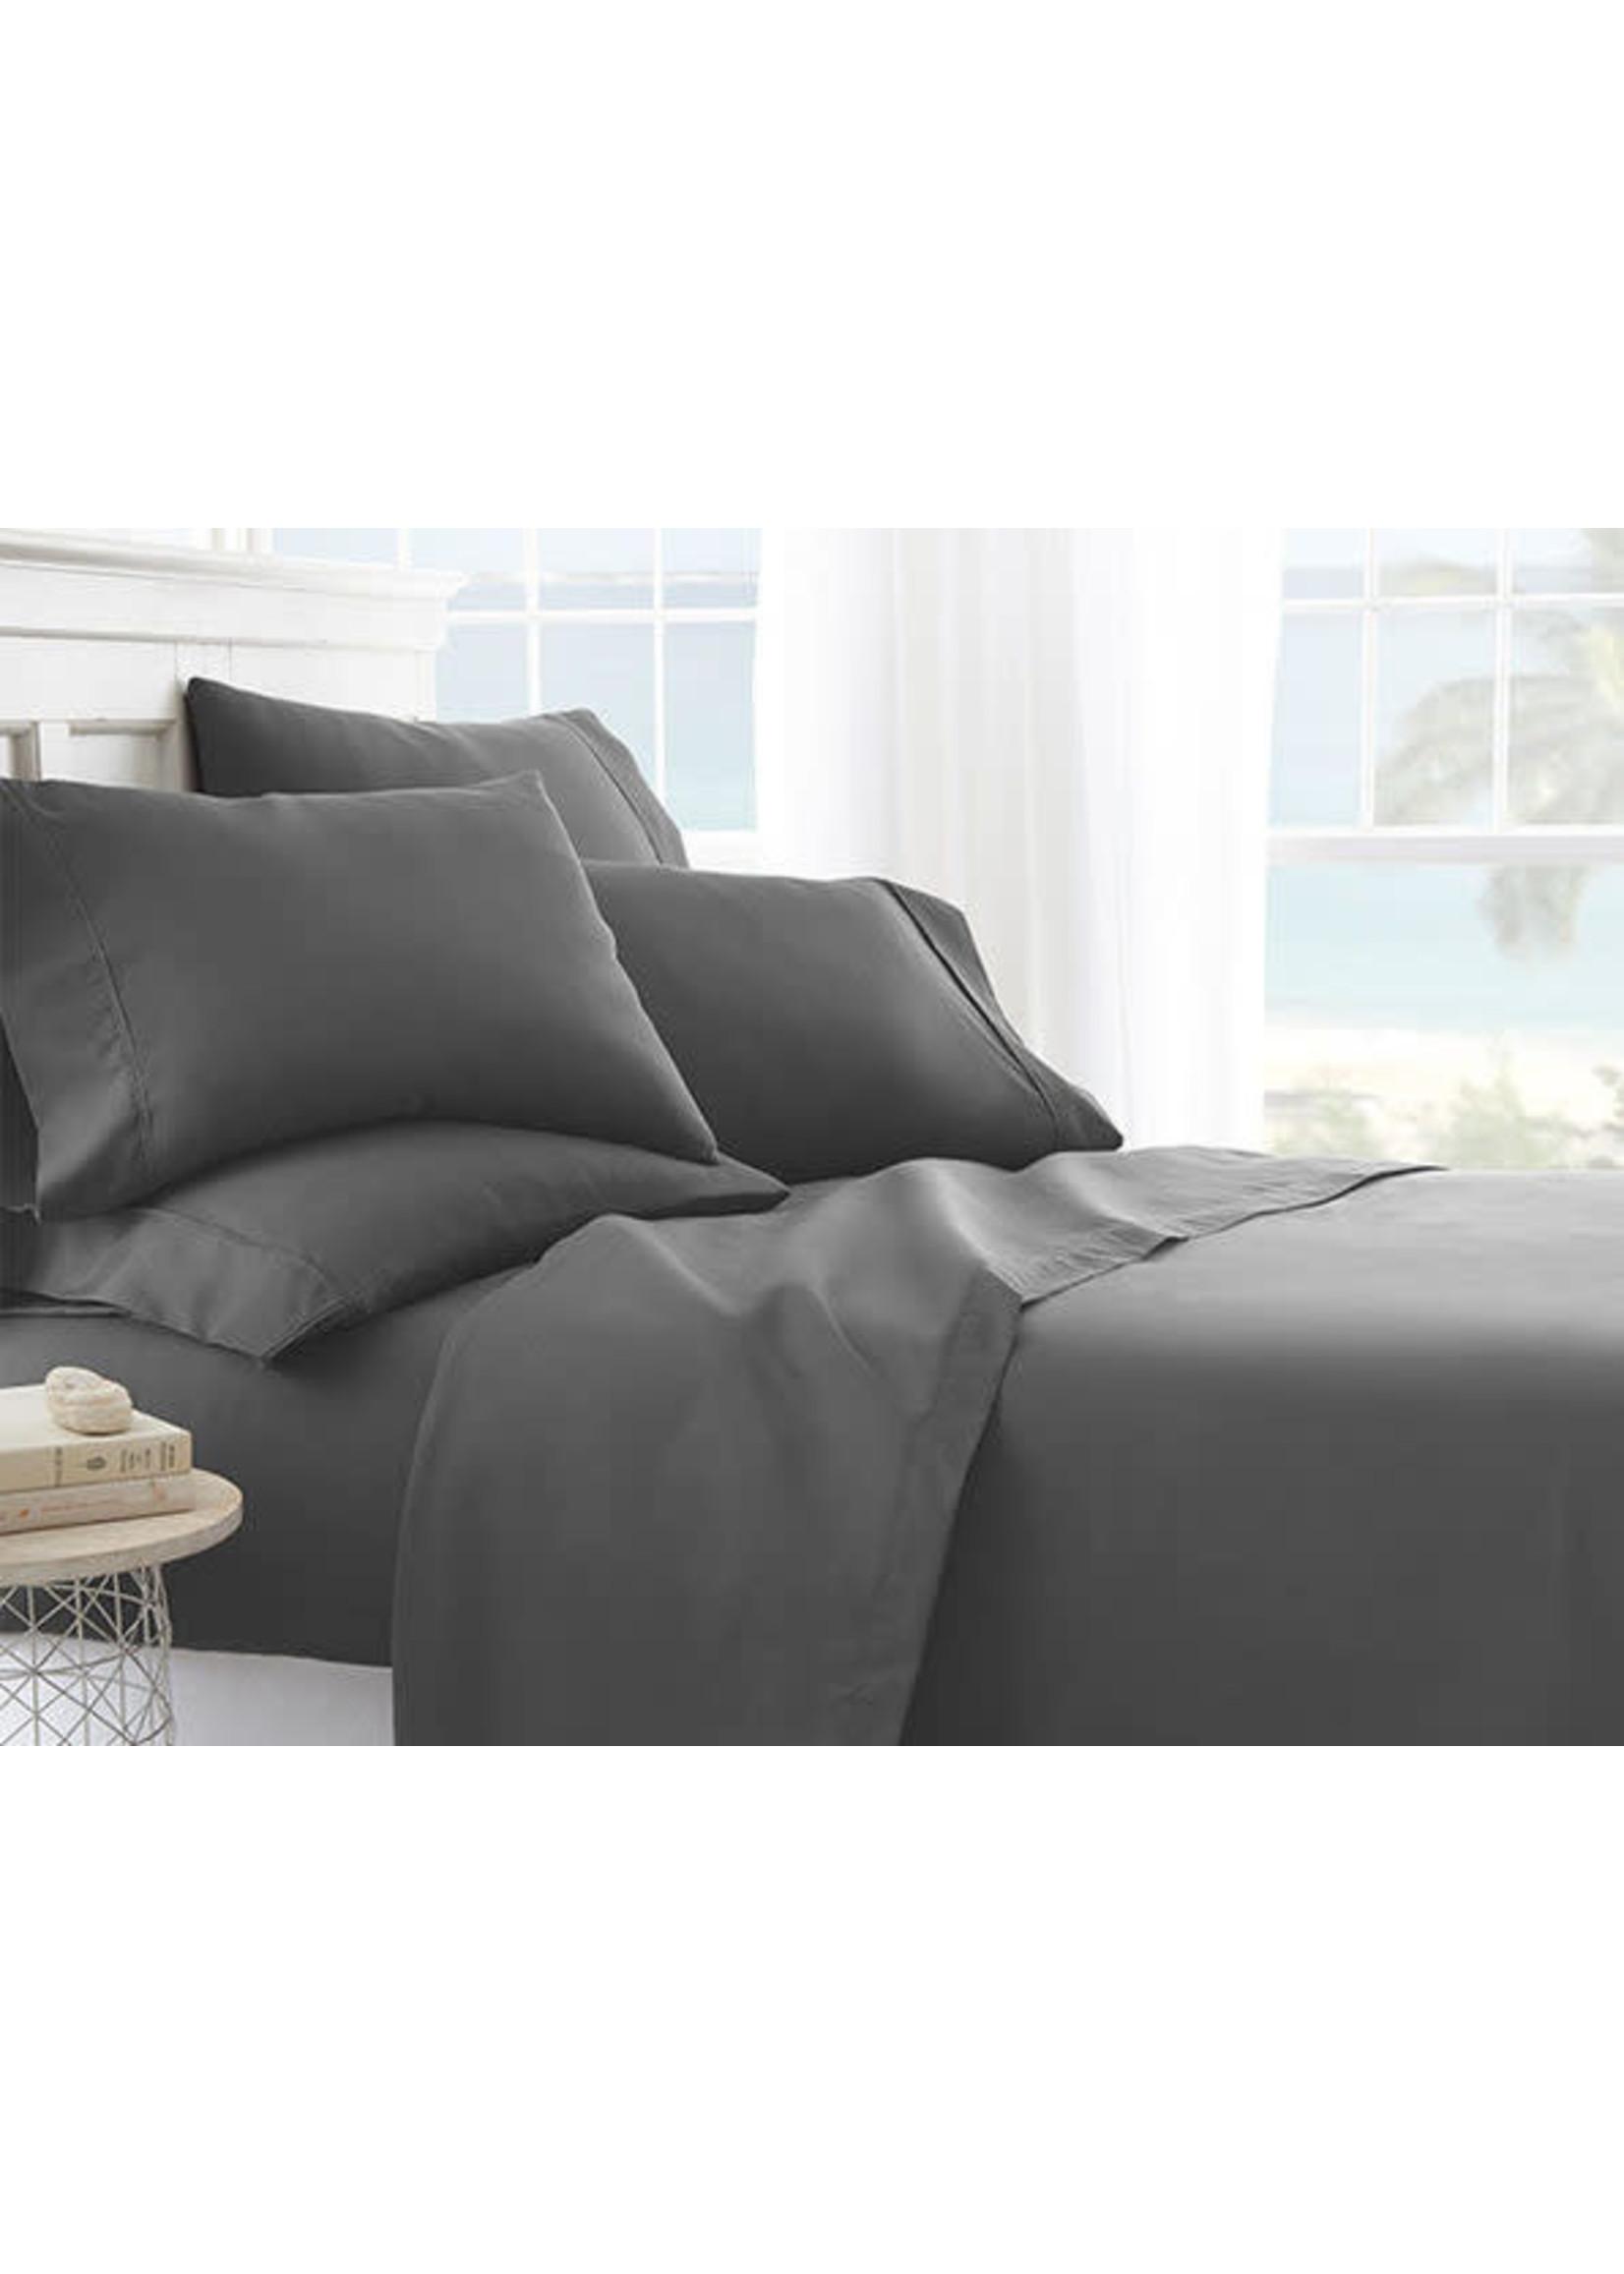 IENJOY HOME KING SIZE ULTRA SOFT 4 PIECE BED SHEET